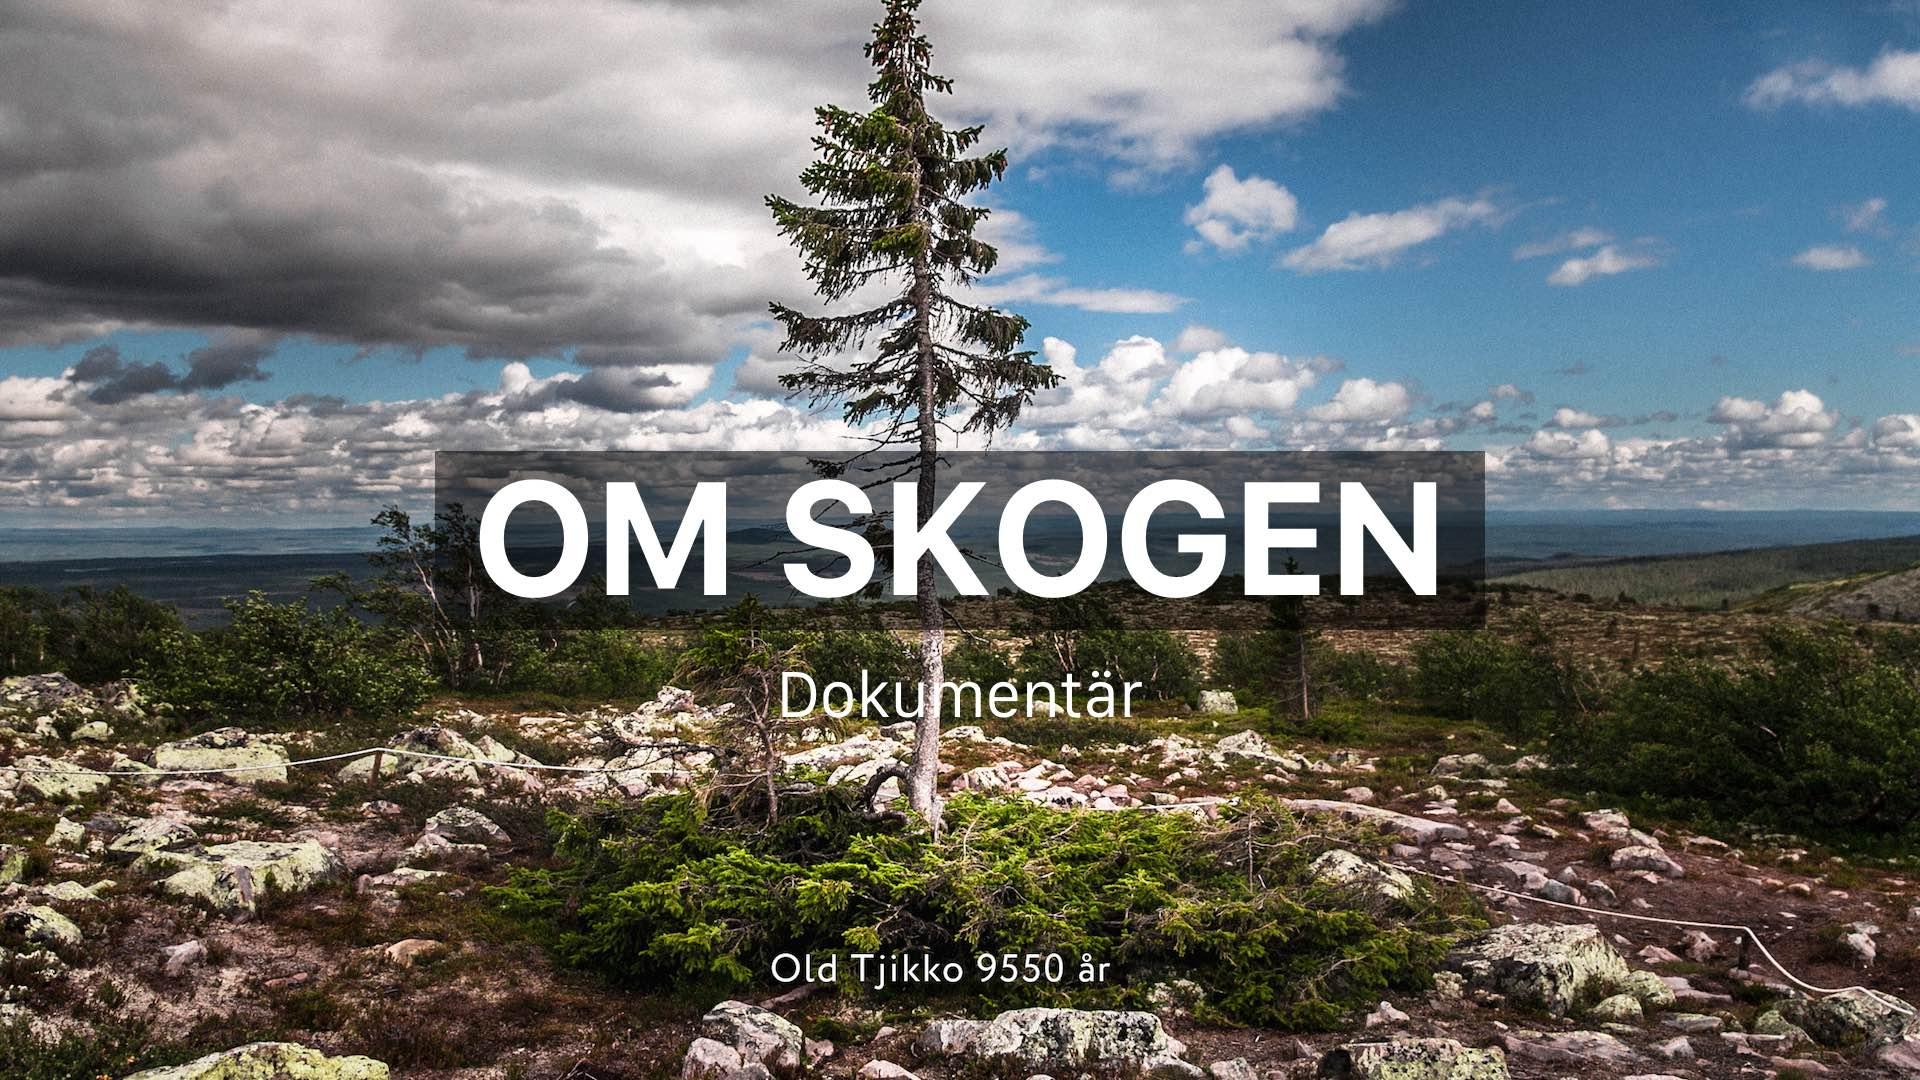 thefuture, Resurs, Om skogen